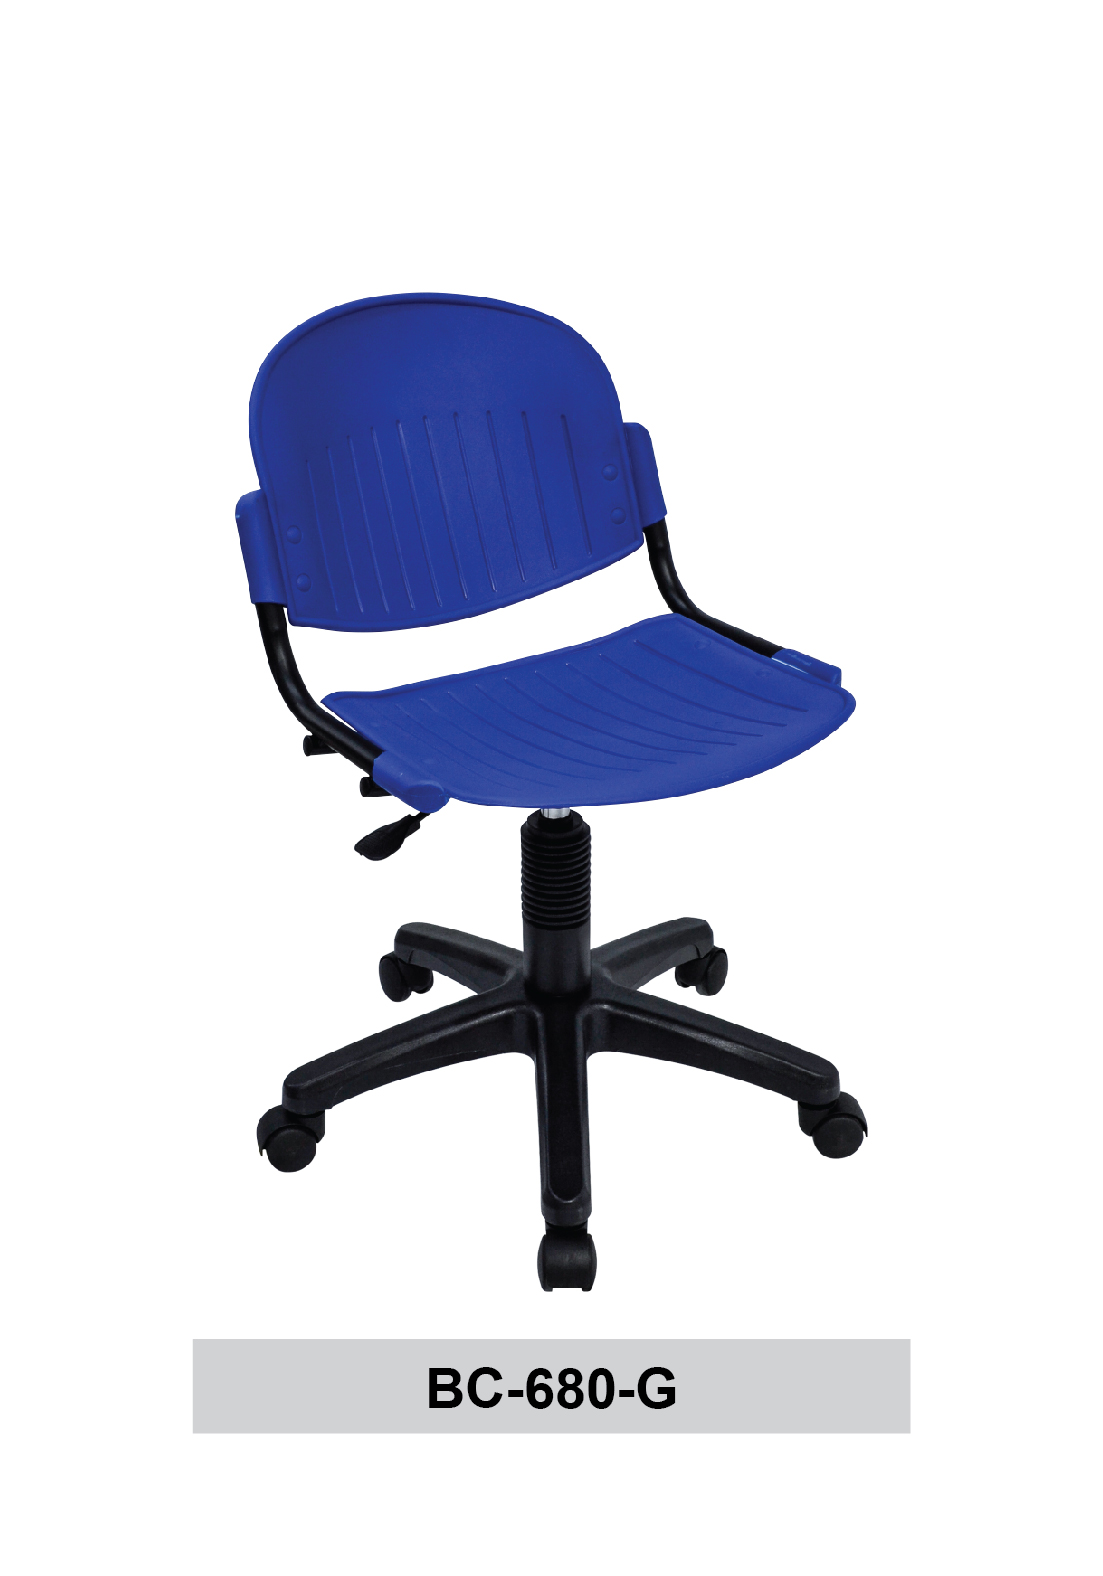 Deco Study Office Hall Meeting Chair Computer Chair Swivel Chair Pre O